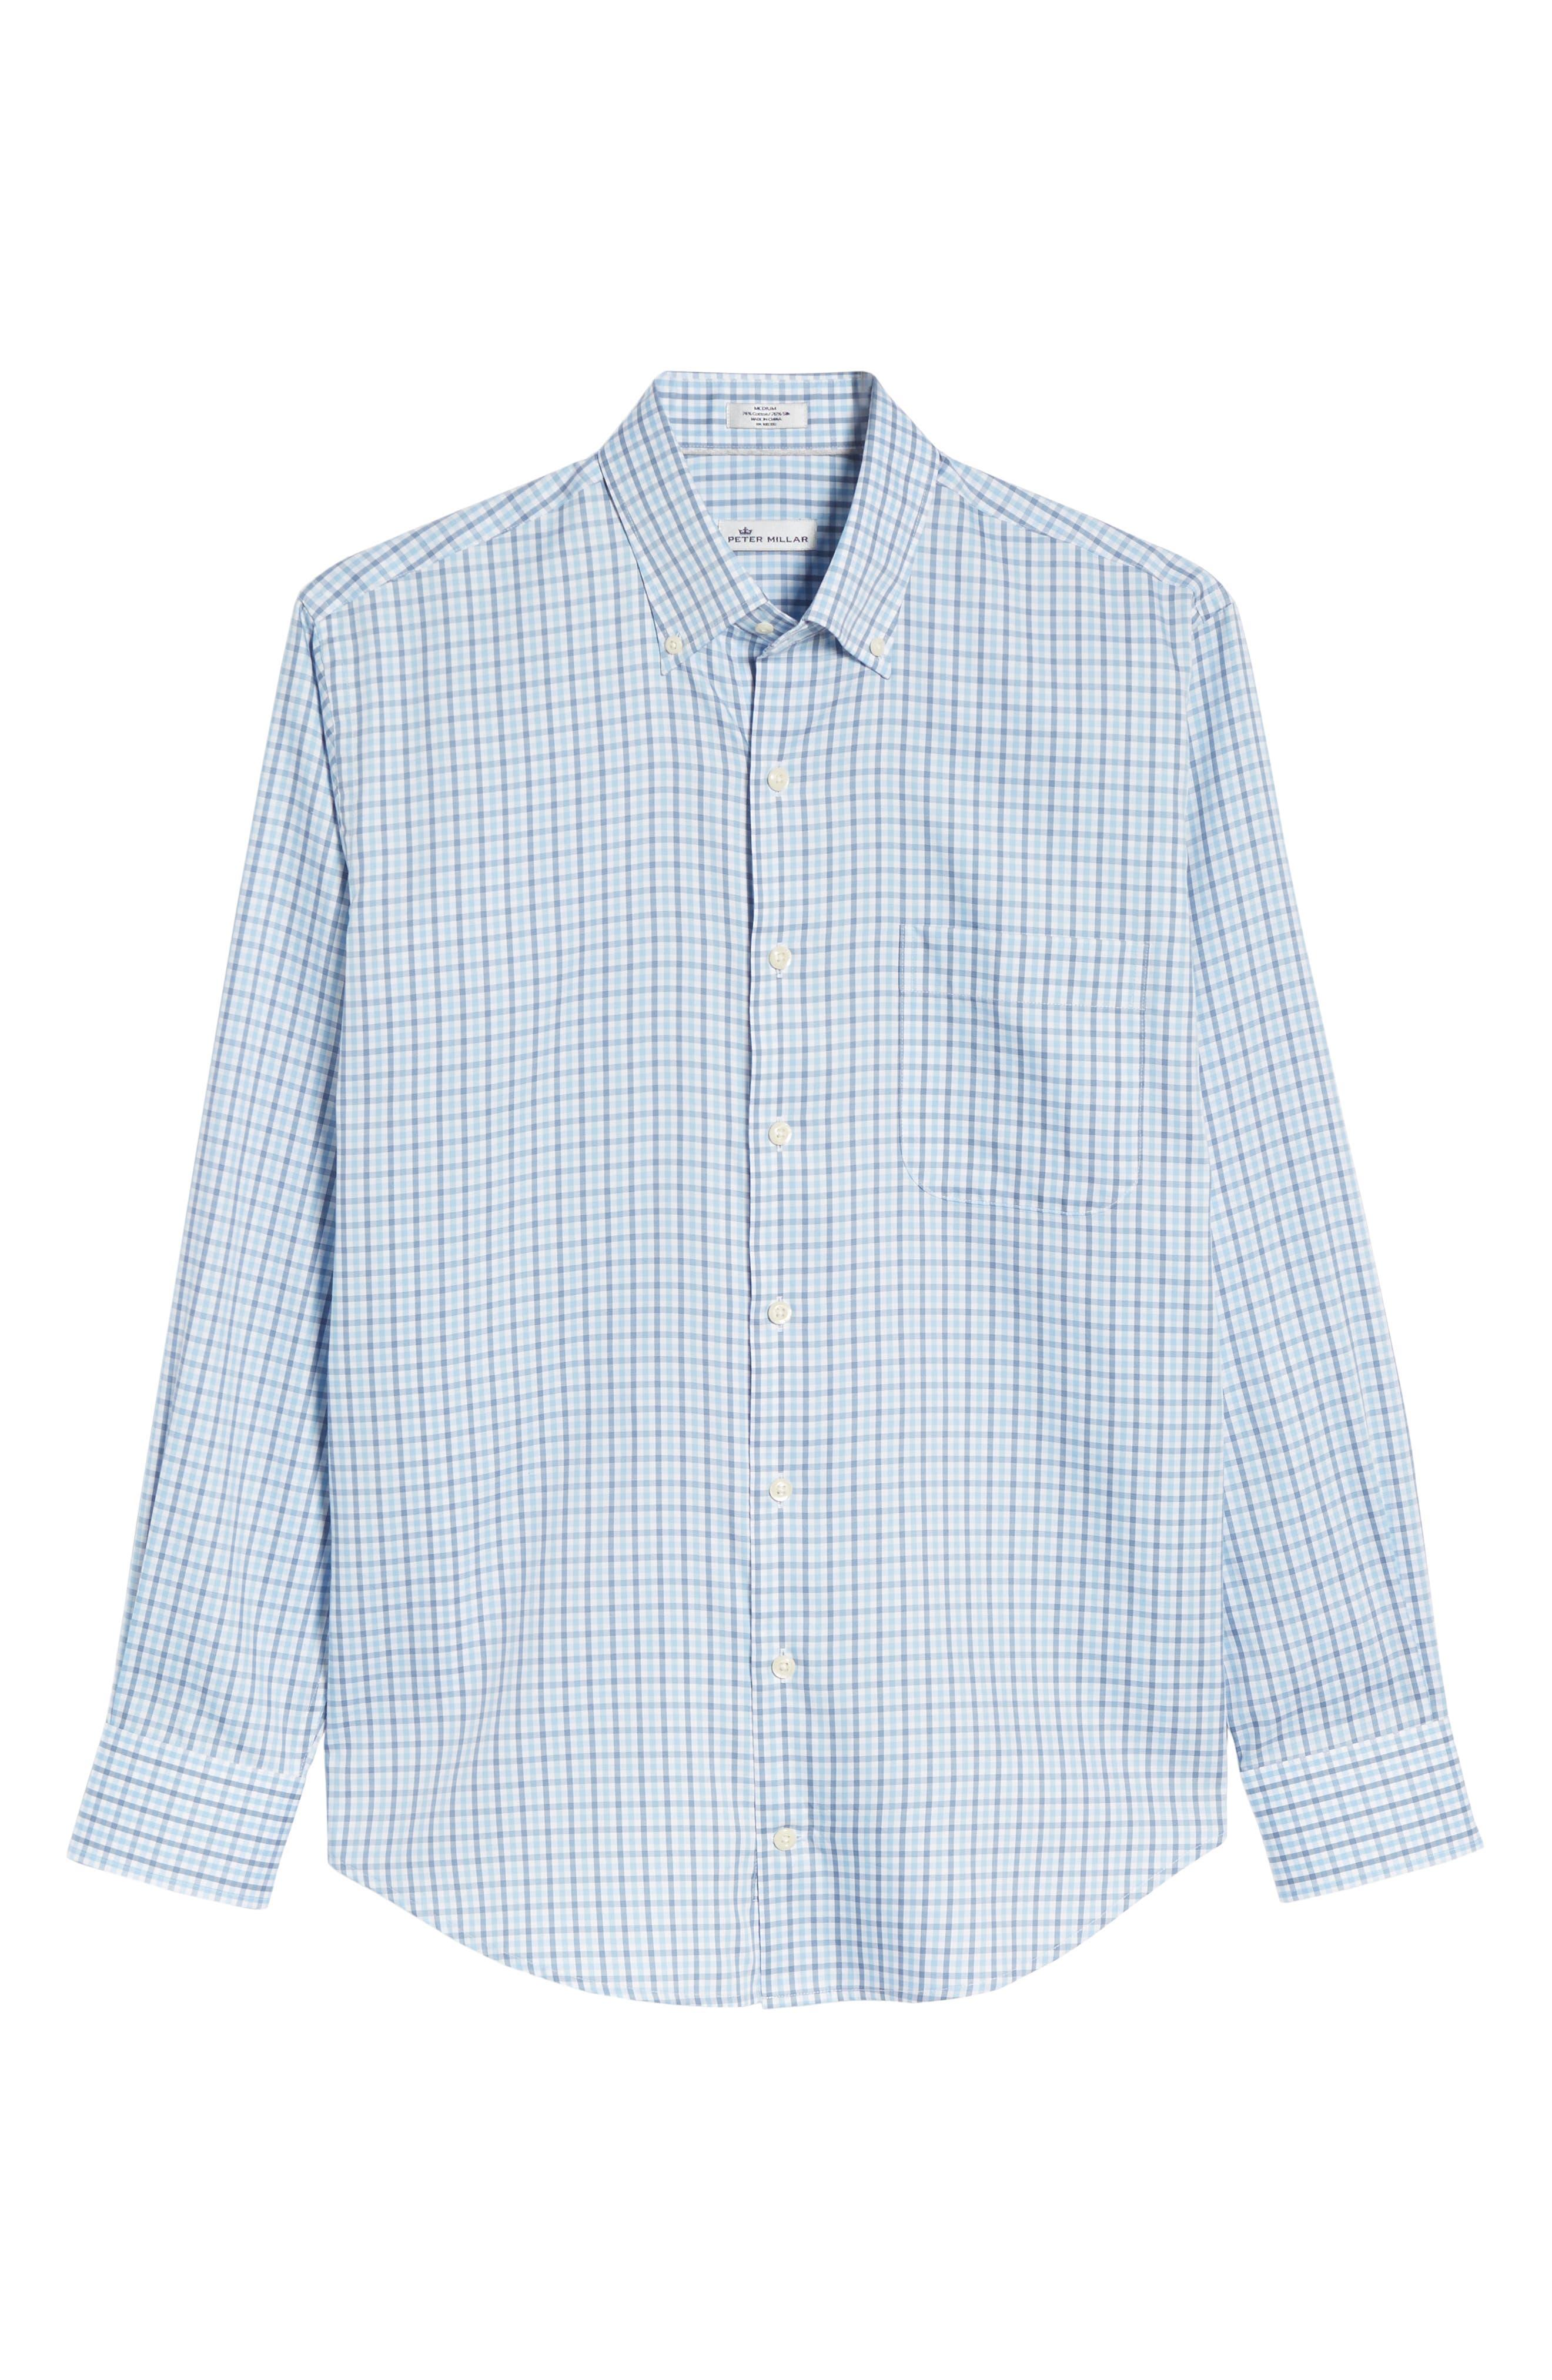 Lake City Regular Fit Tattersall Sport Shirt,                             Alternate thumbnail 6, color,                             COTTAGE BLUE